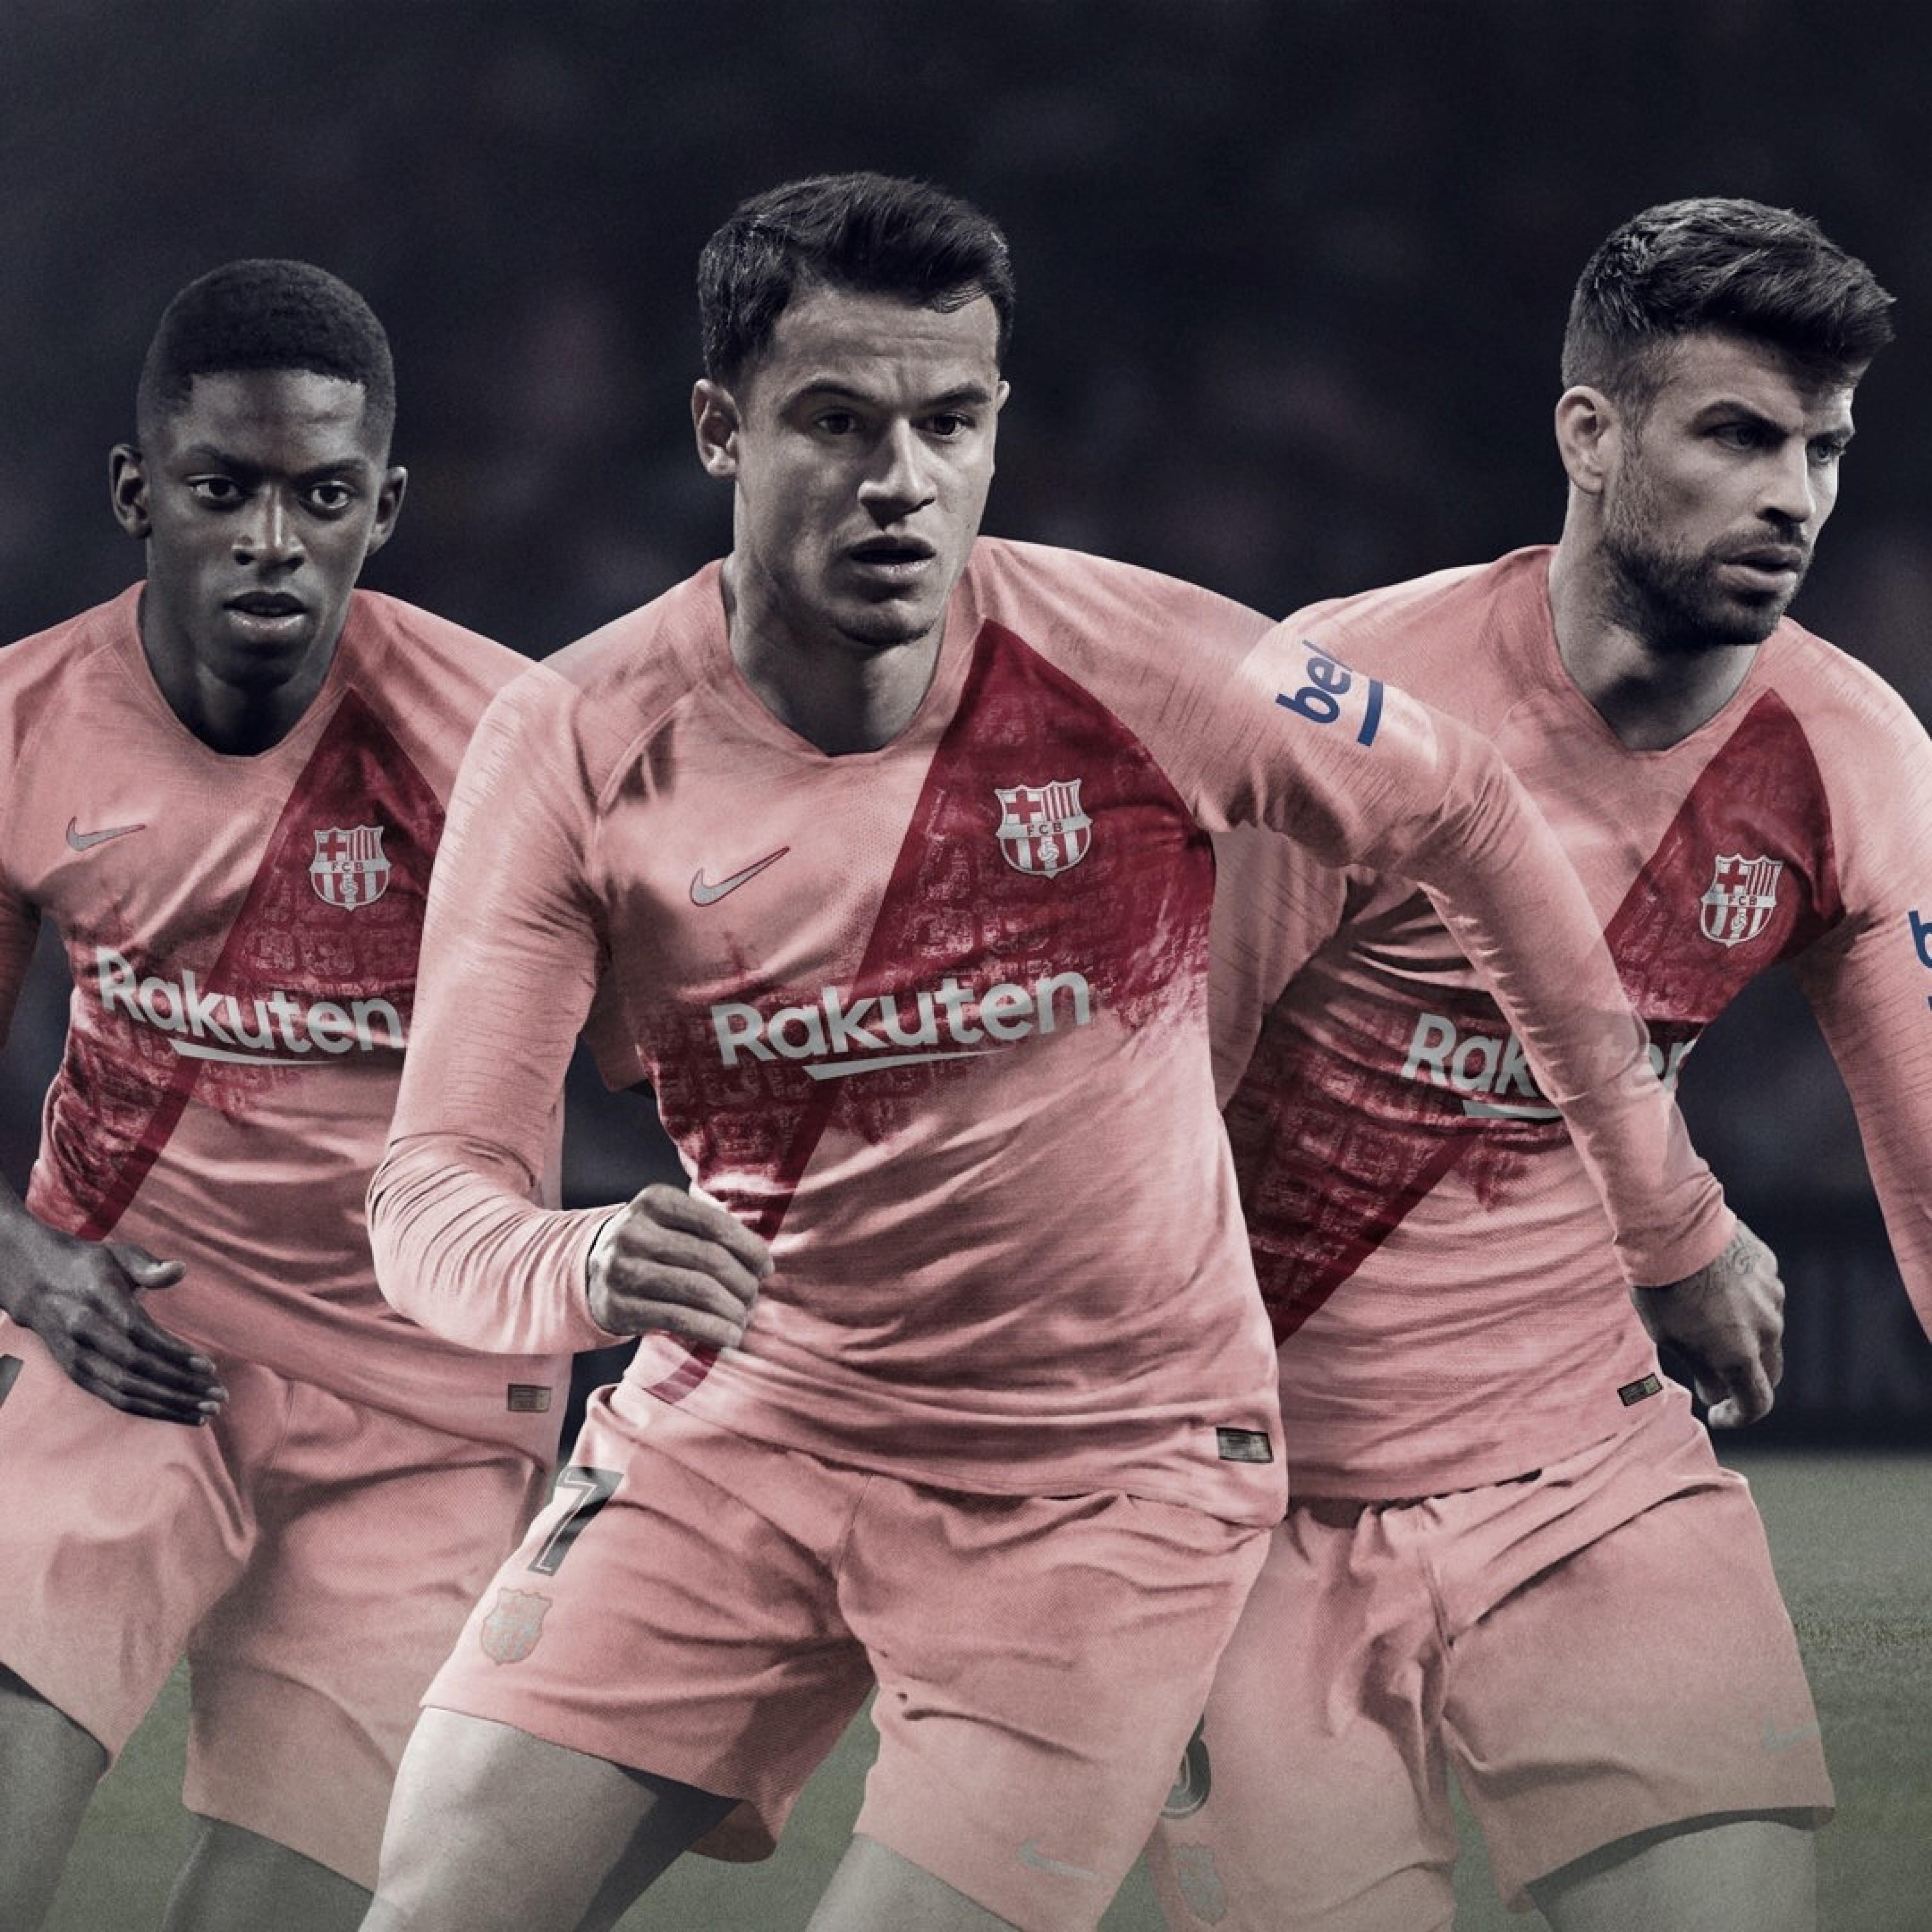 Barcelona anuncia terceiro uniforme para a temporada 2018-19